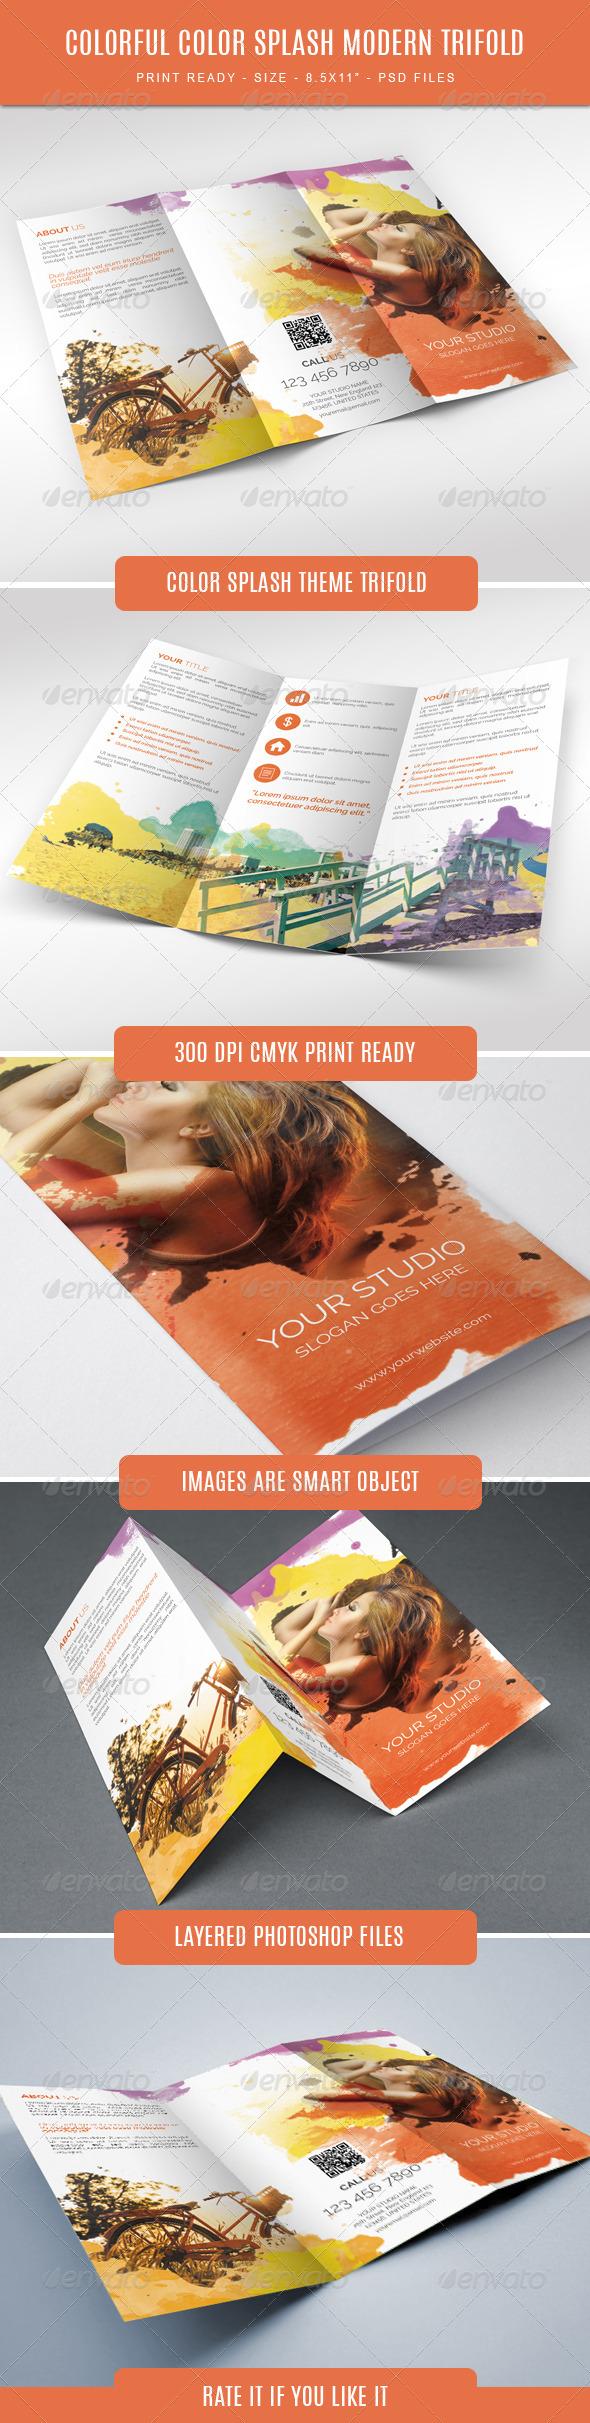 GraphicRiver Colorful Color Splash Modern Trifold 7801100